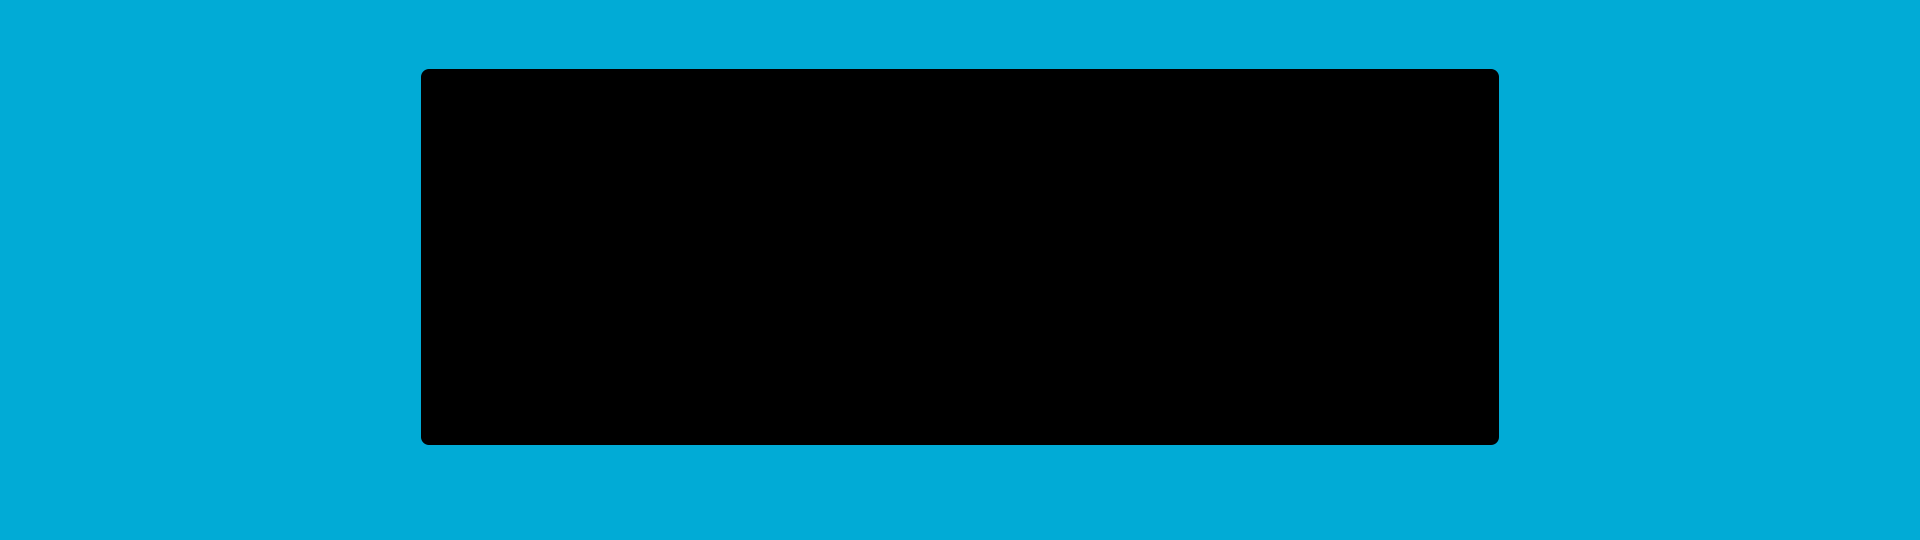 CATEGORY-BILG-KULAKLIKLARDASEPETTE10INDIRIM-11-07